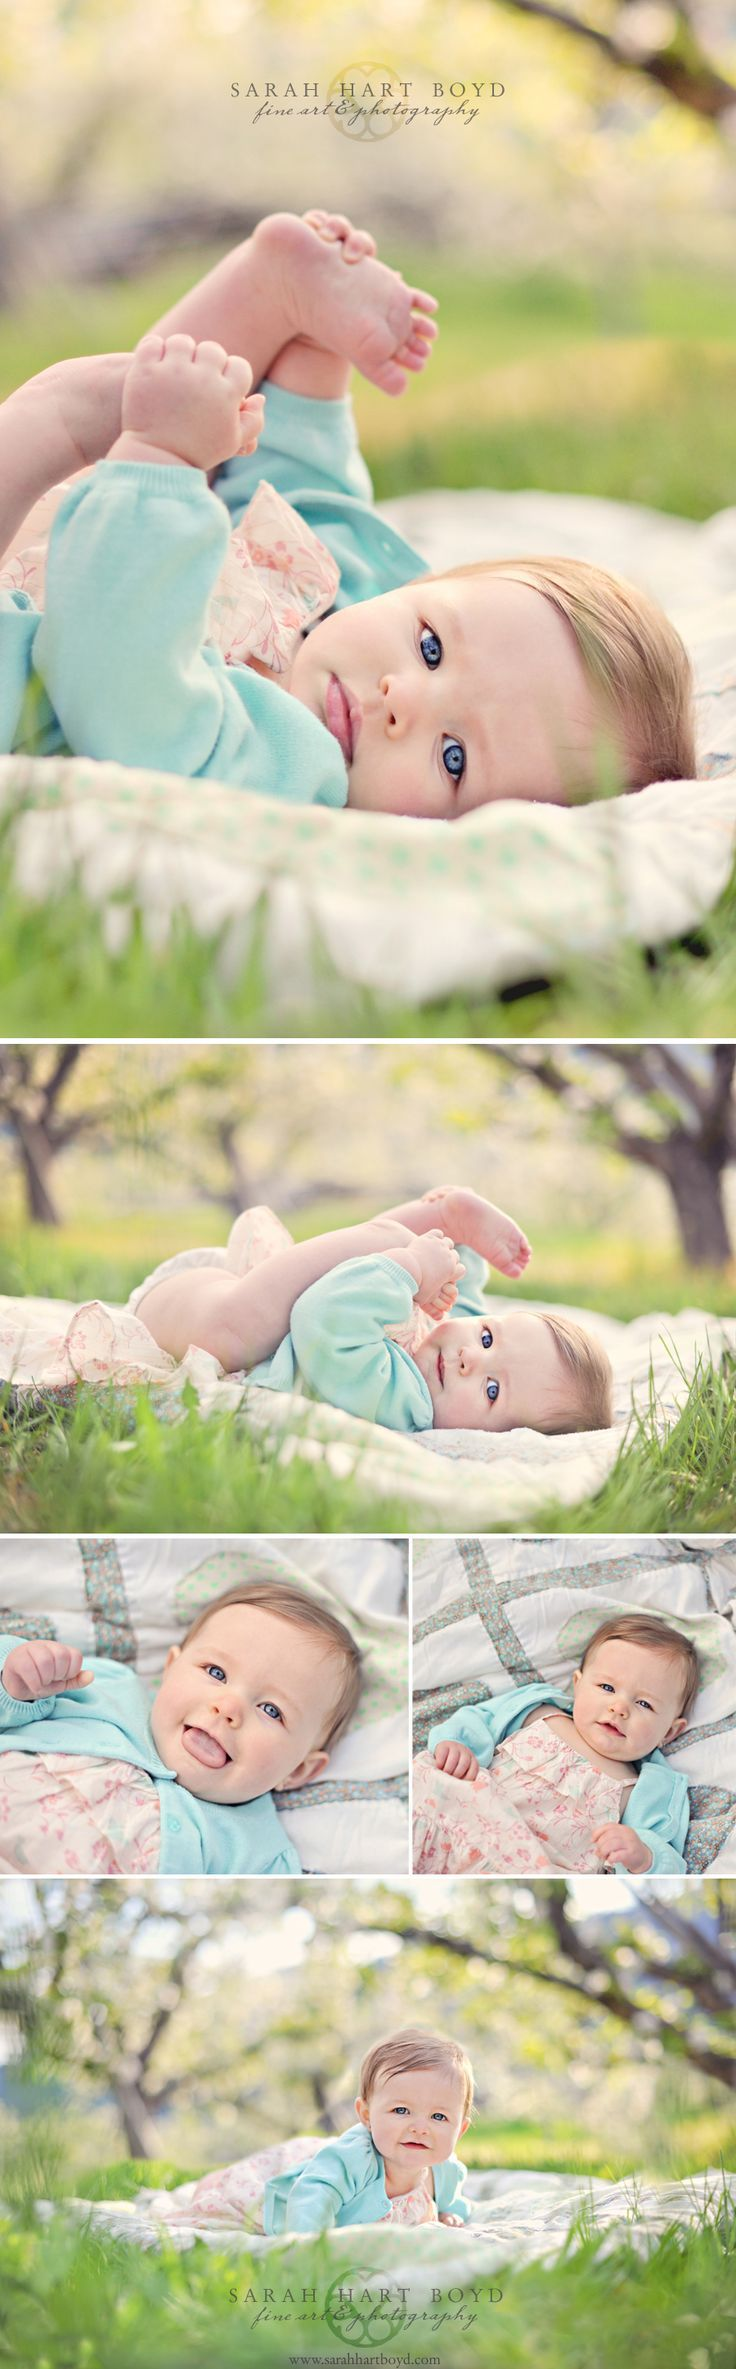 Spring Baby Photography Idea